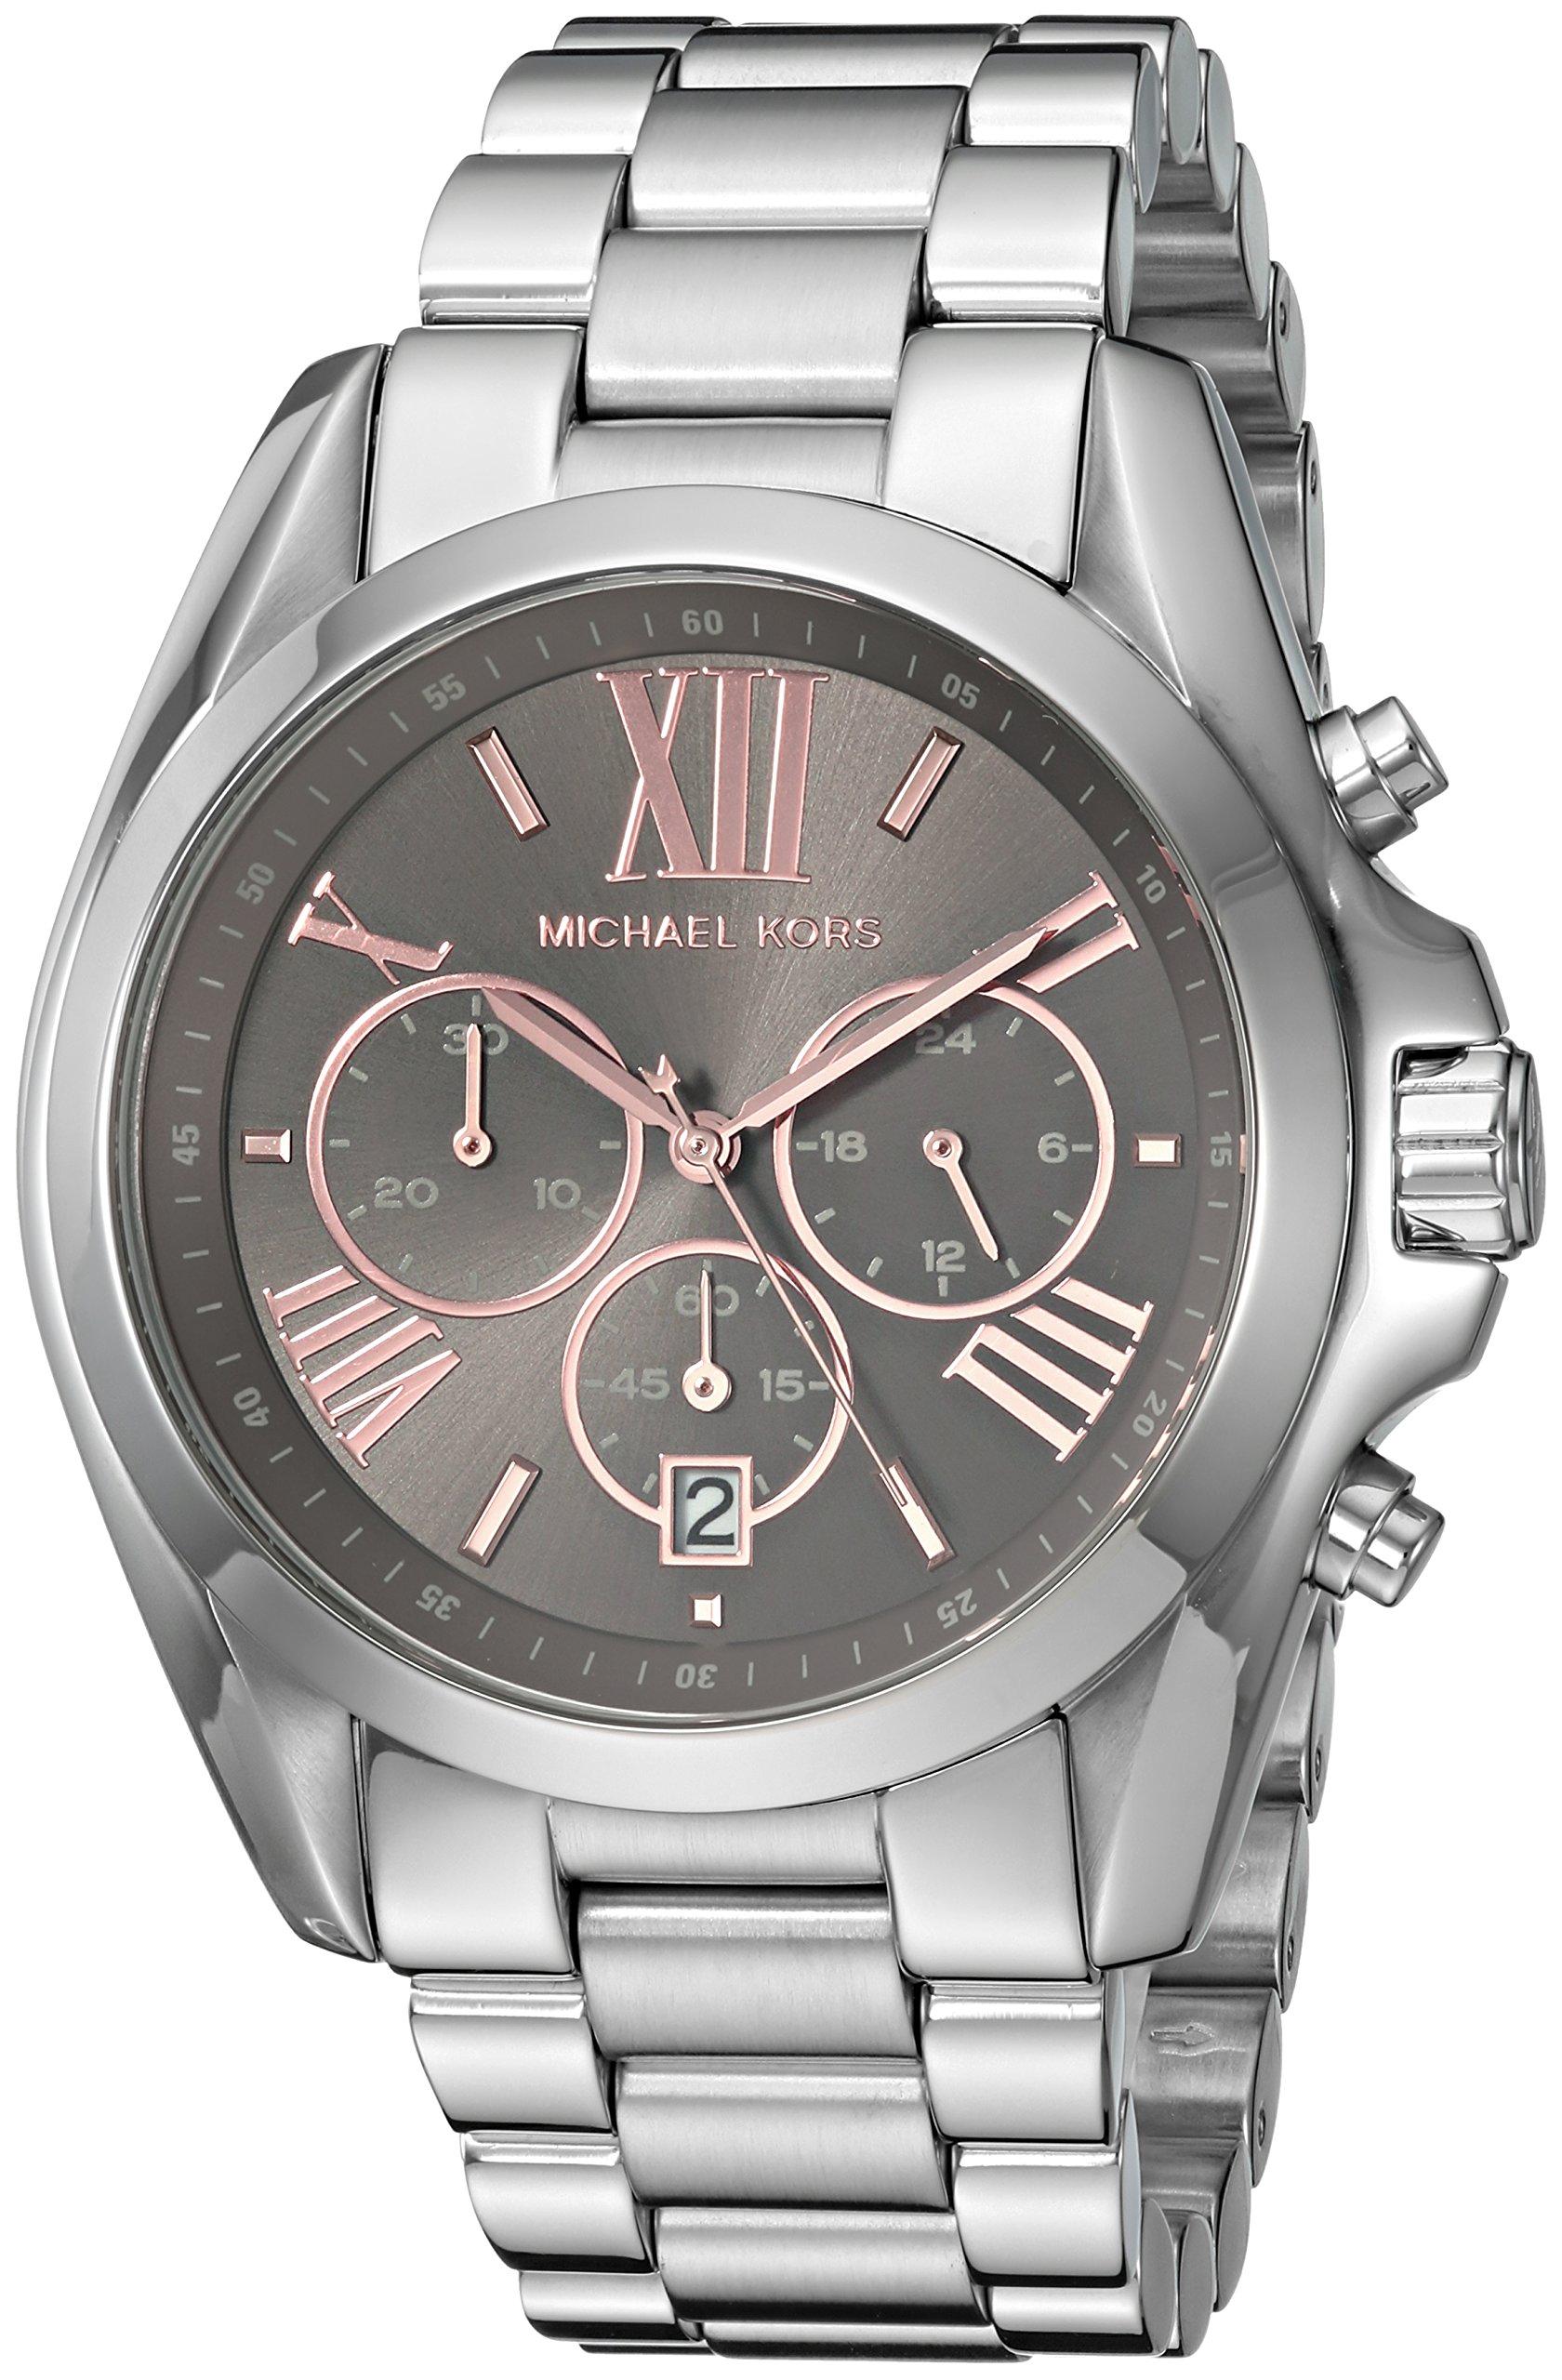 Michael Kors Women's 'Bradshaw' Quartz Stainless Steel Casual Watch, Color:Silver-Toned (Model: MK6557)